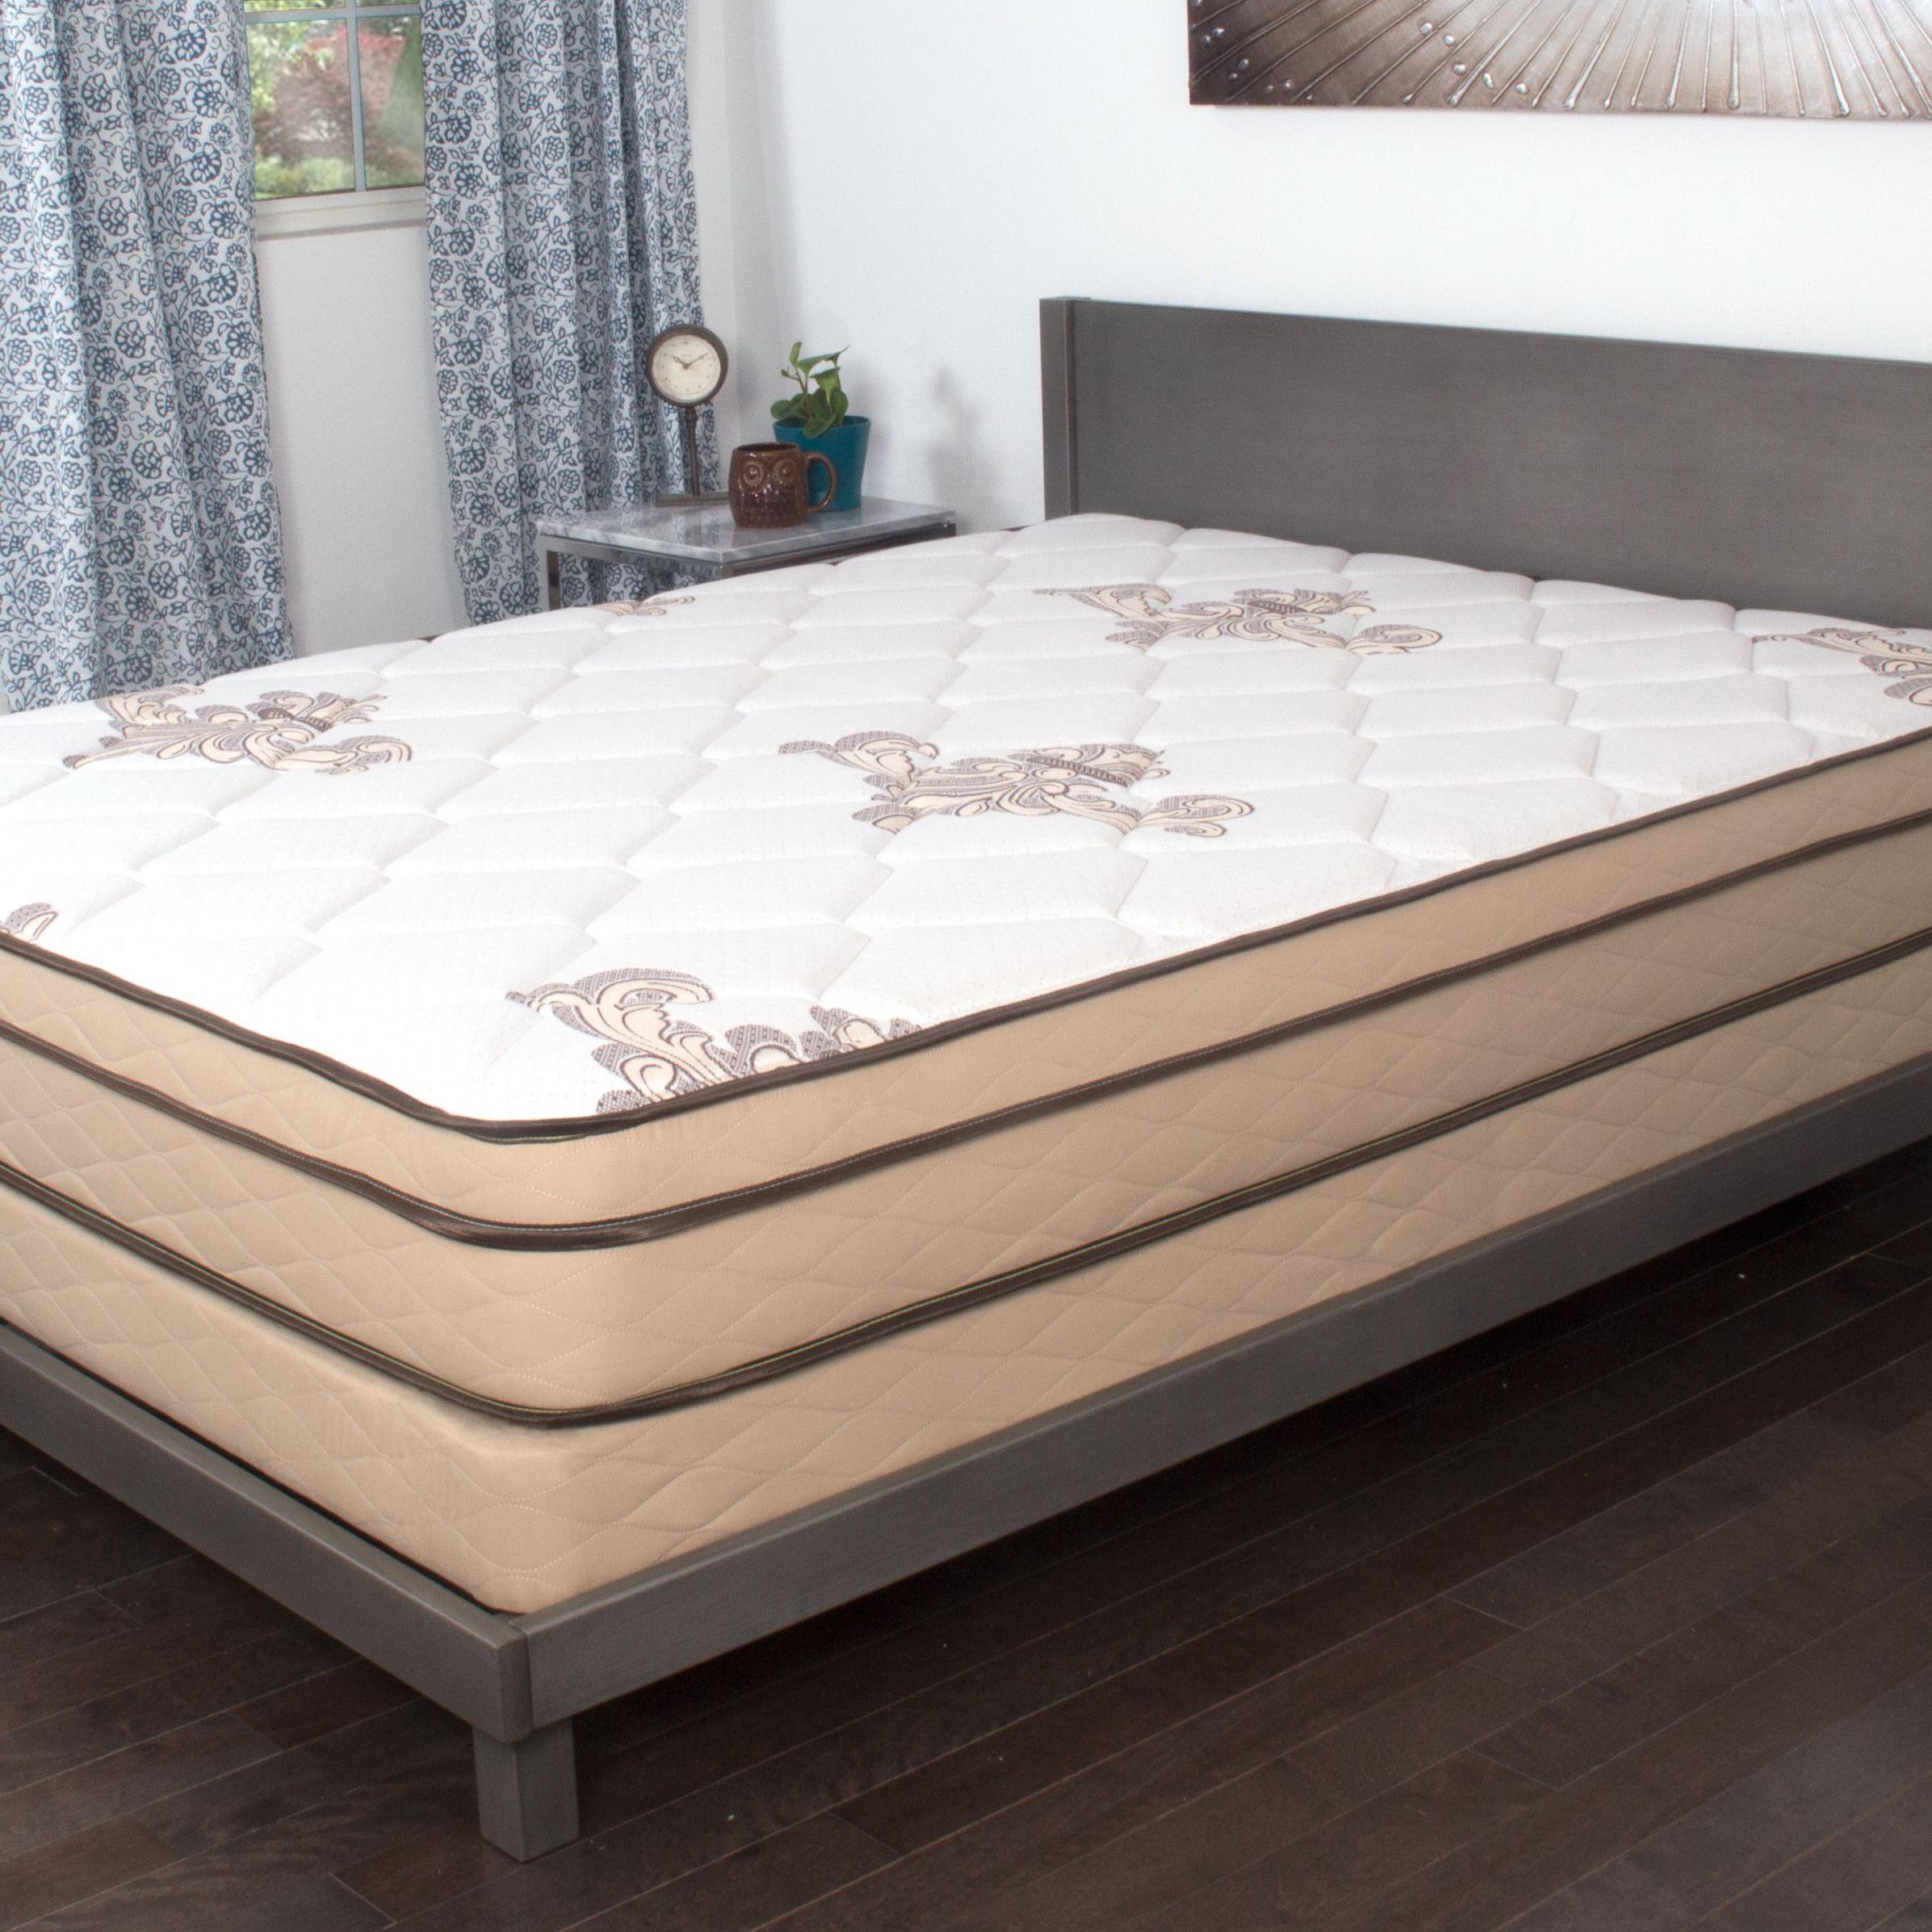 nuform quilted euro top 9inch twin xlsize foam mattress walmartcom